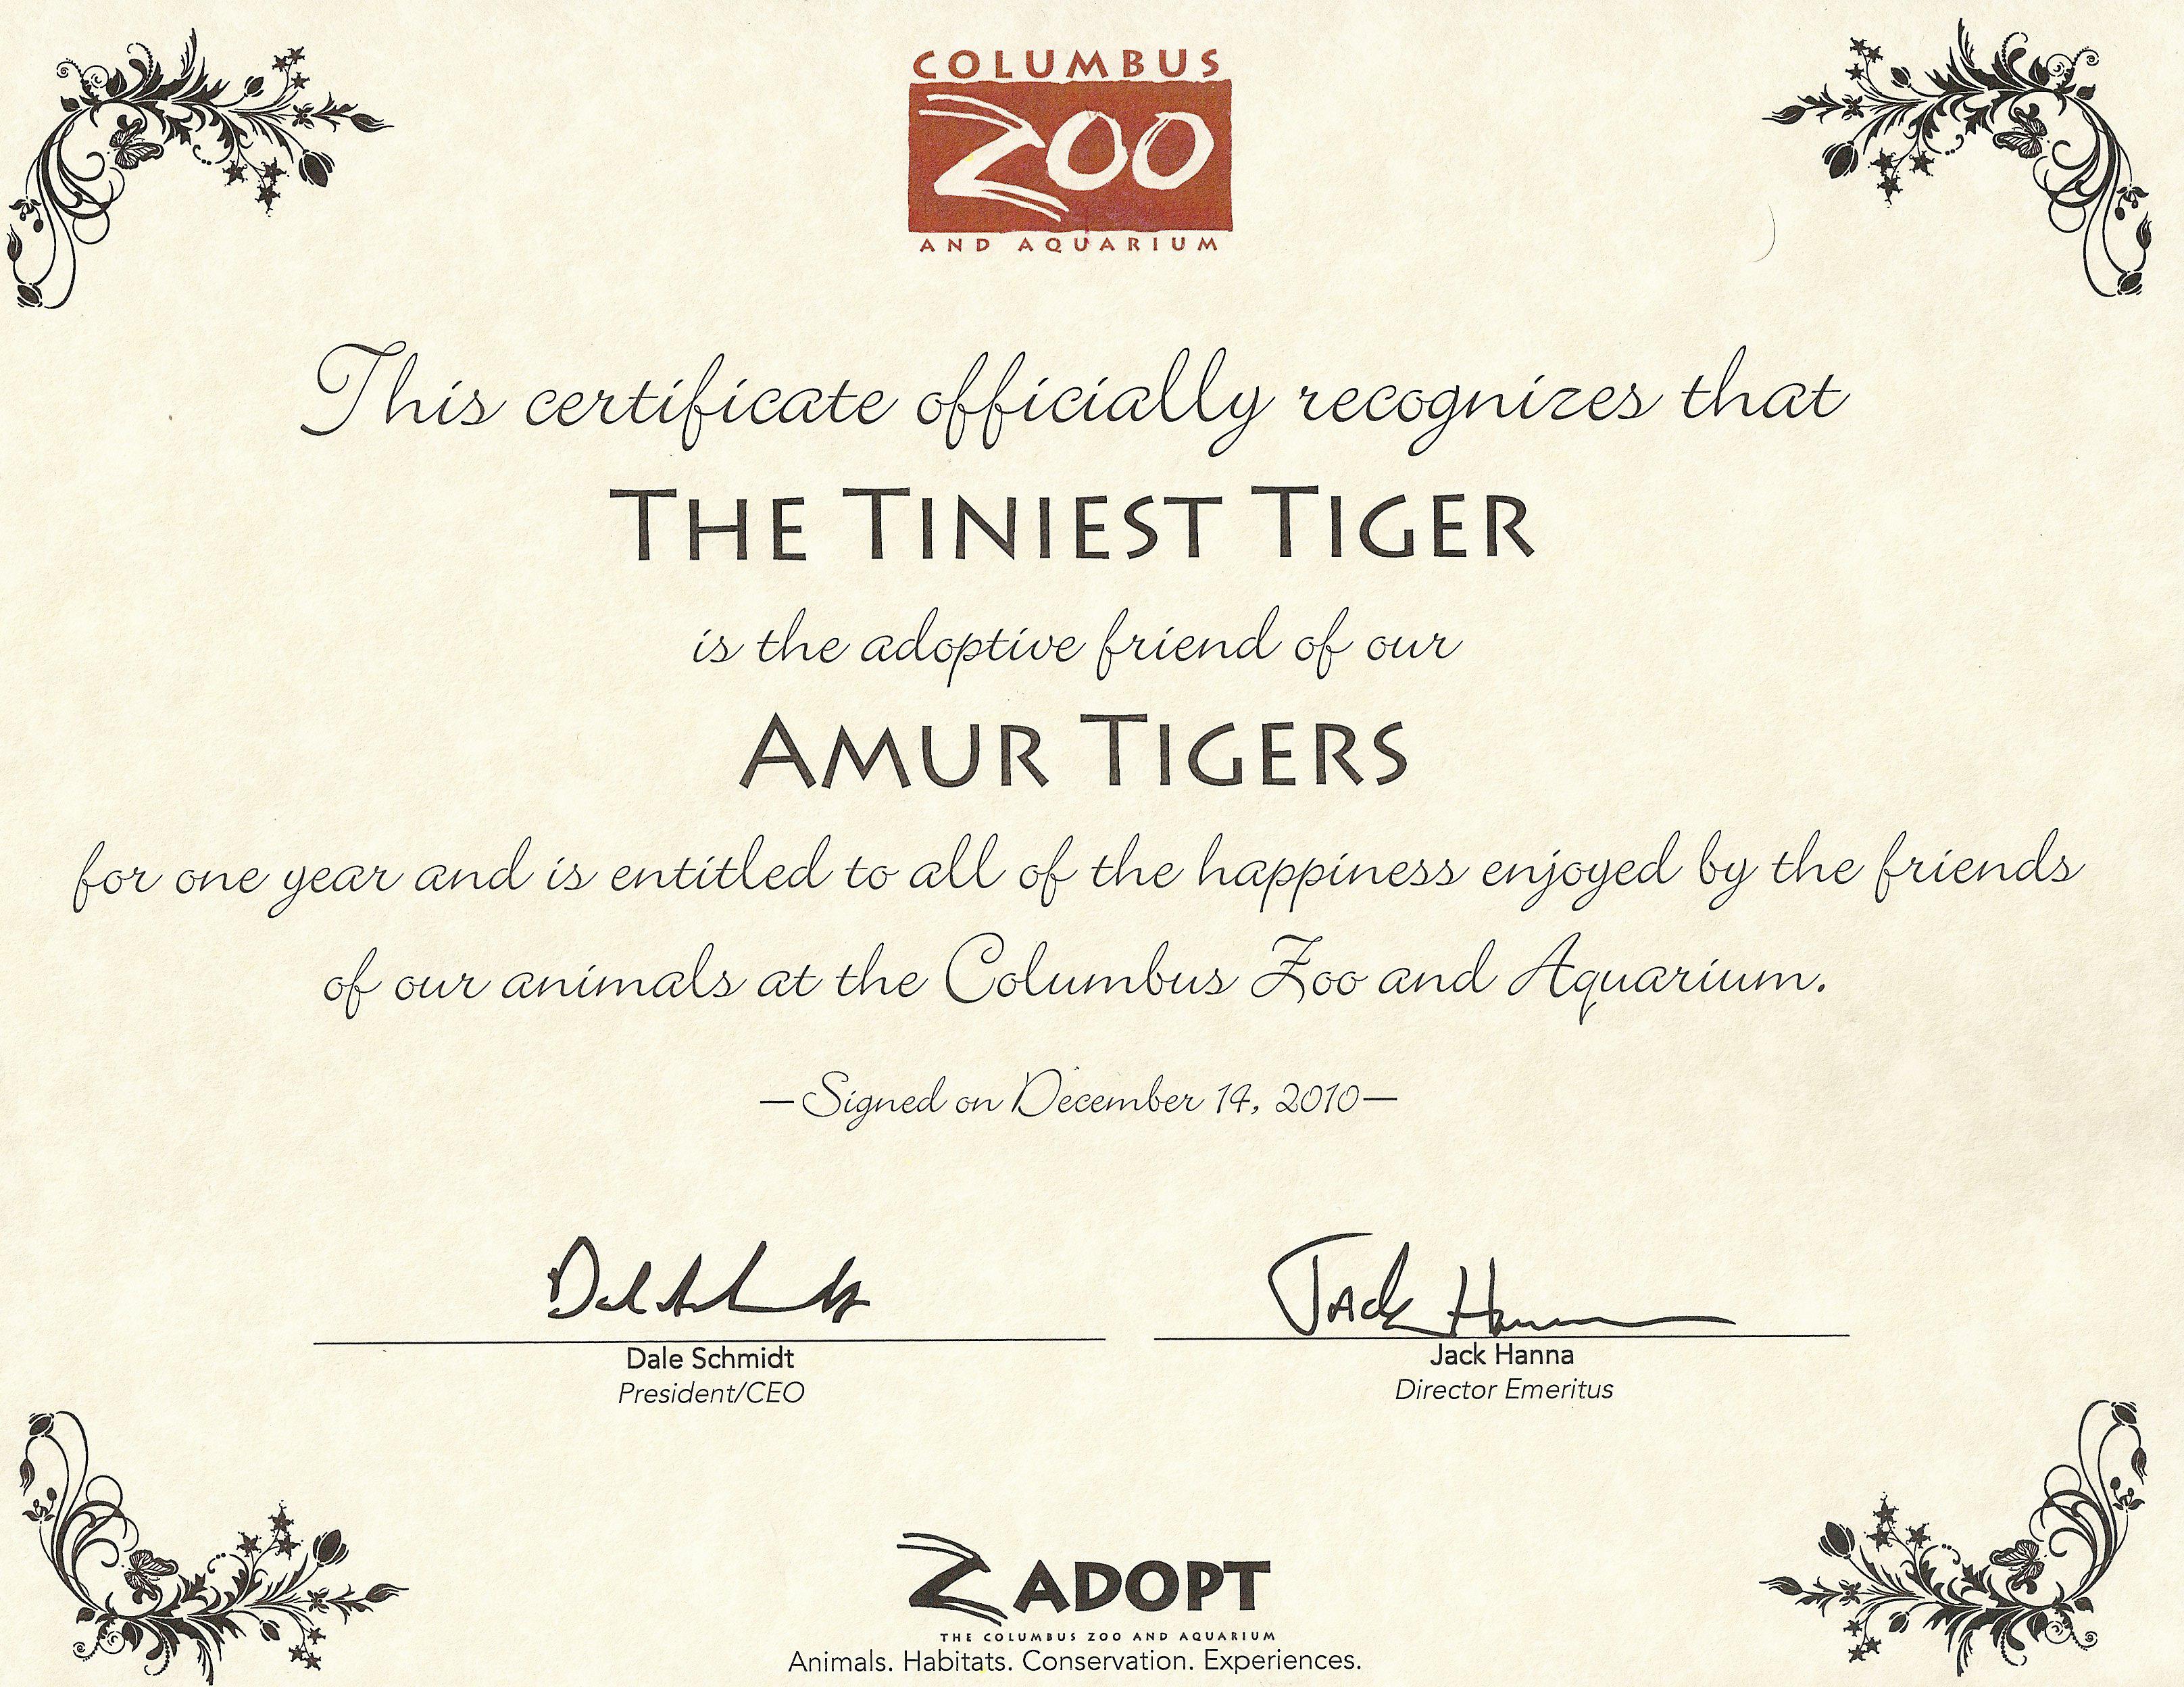 Columbus Zoo's Amur Tigers